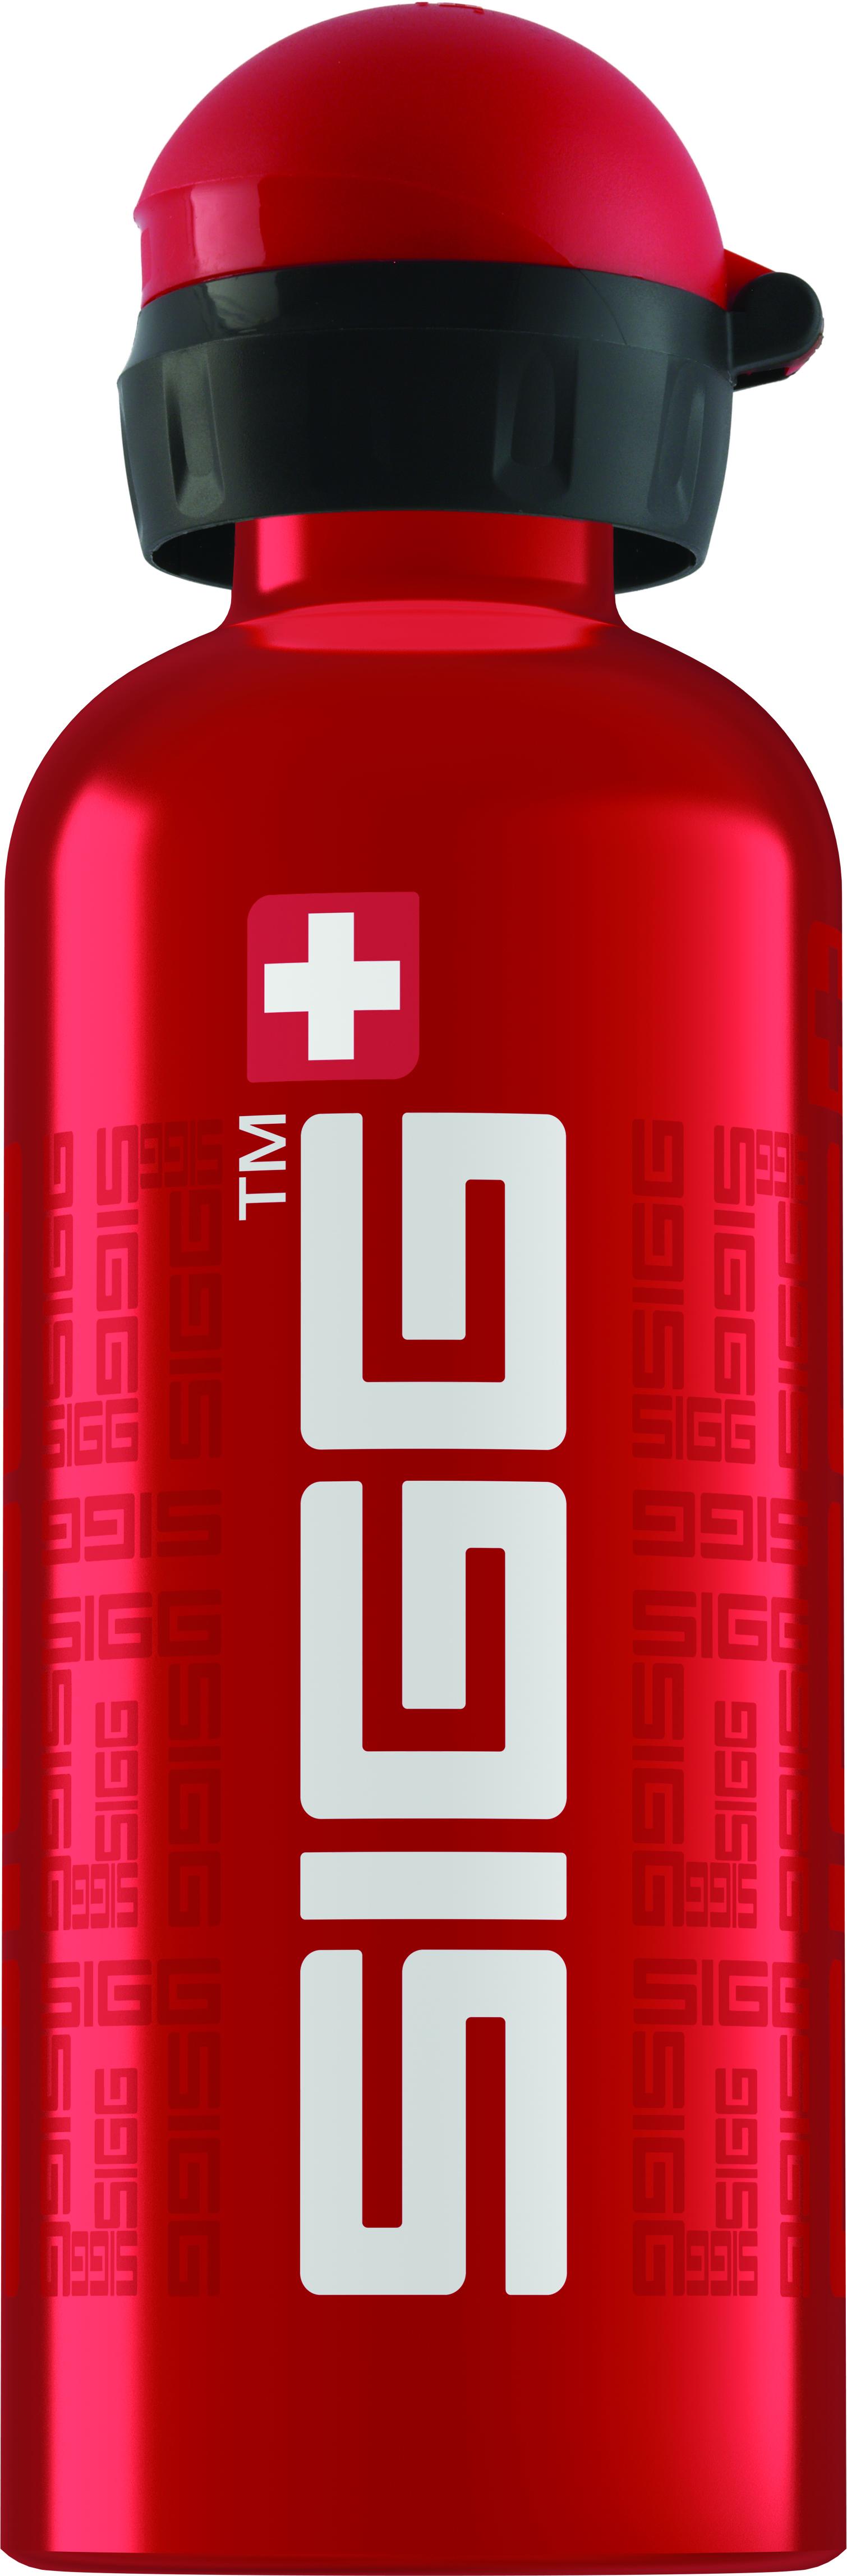 Sigg SIGGnature Red 600 ml